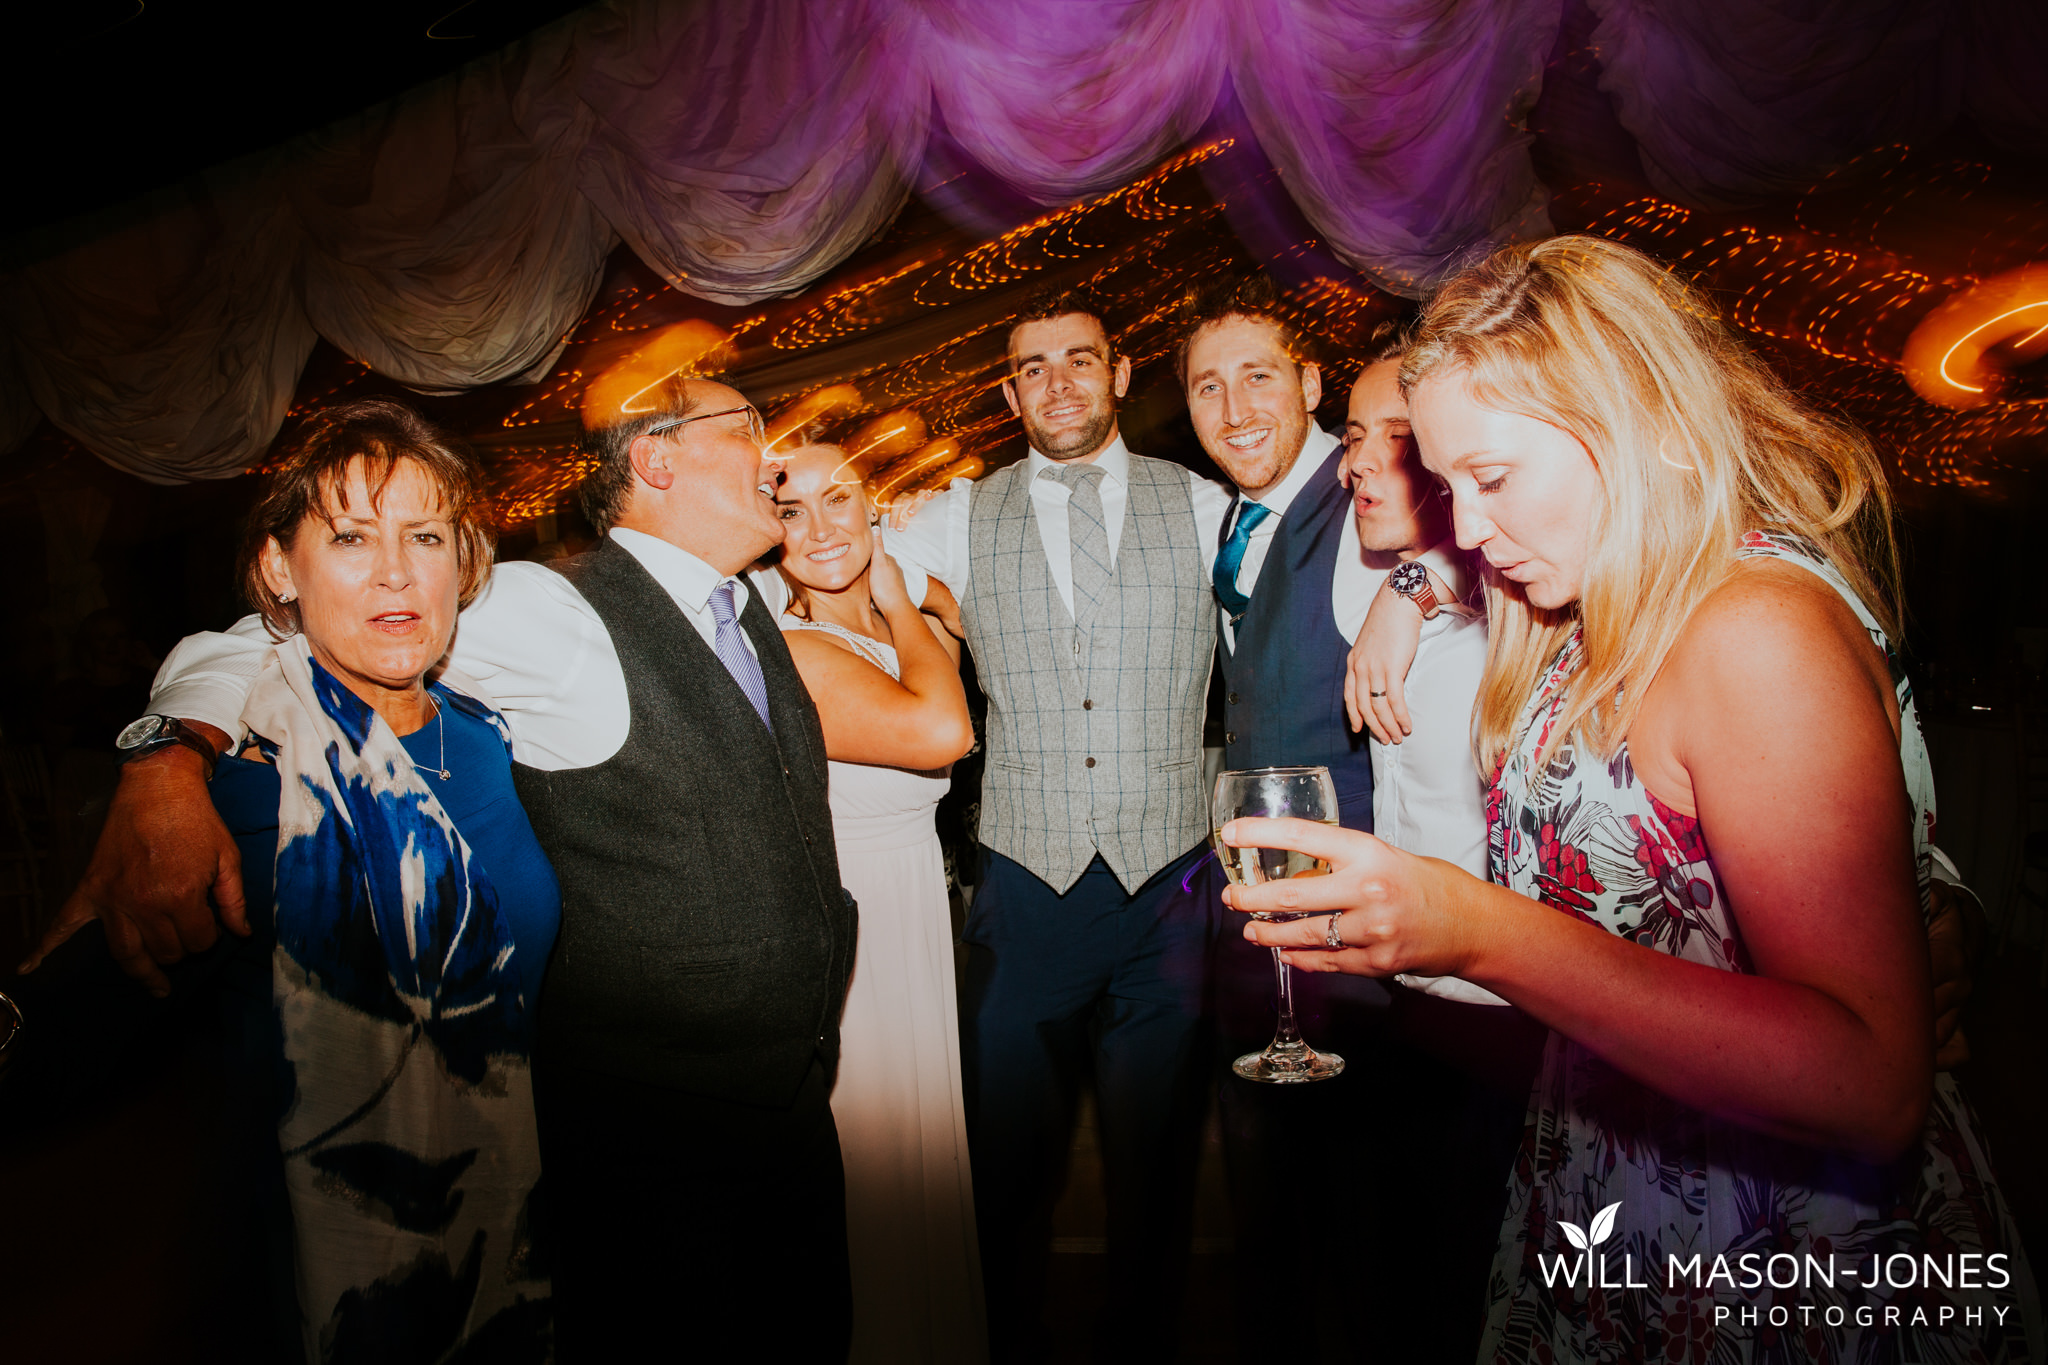 plas-glansevin-fun-evening-reception-dancefloor-photographer-swansea-8.jpg